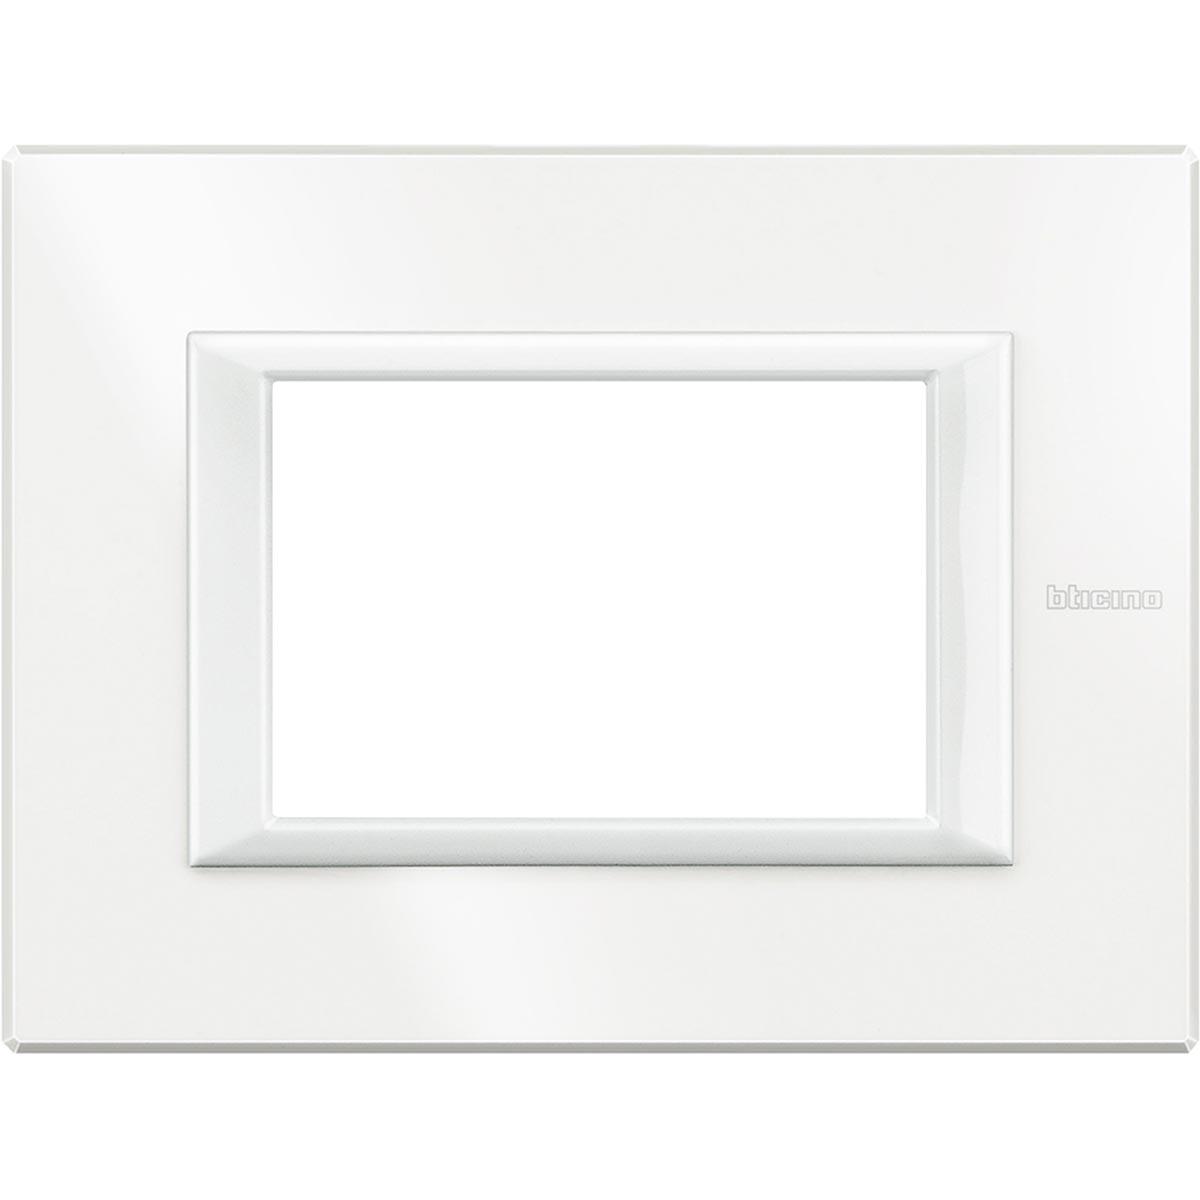 HA4803HD placche axolute bticino bianca 3 posti